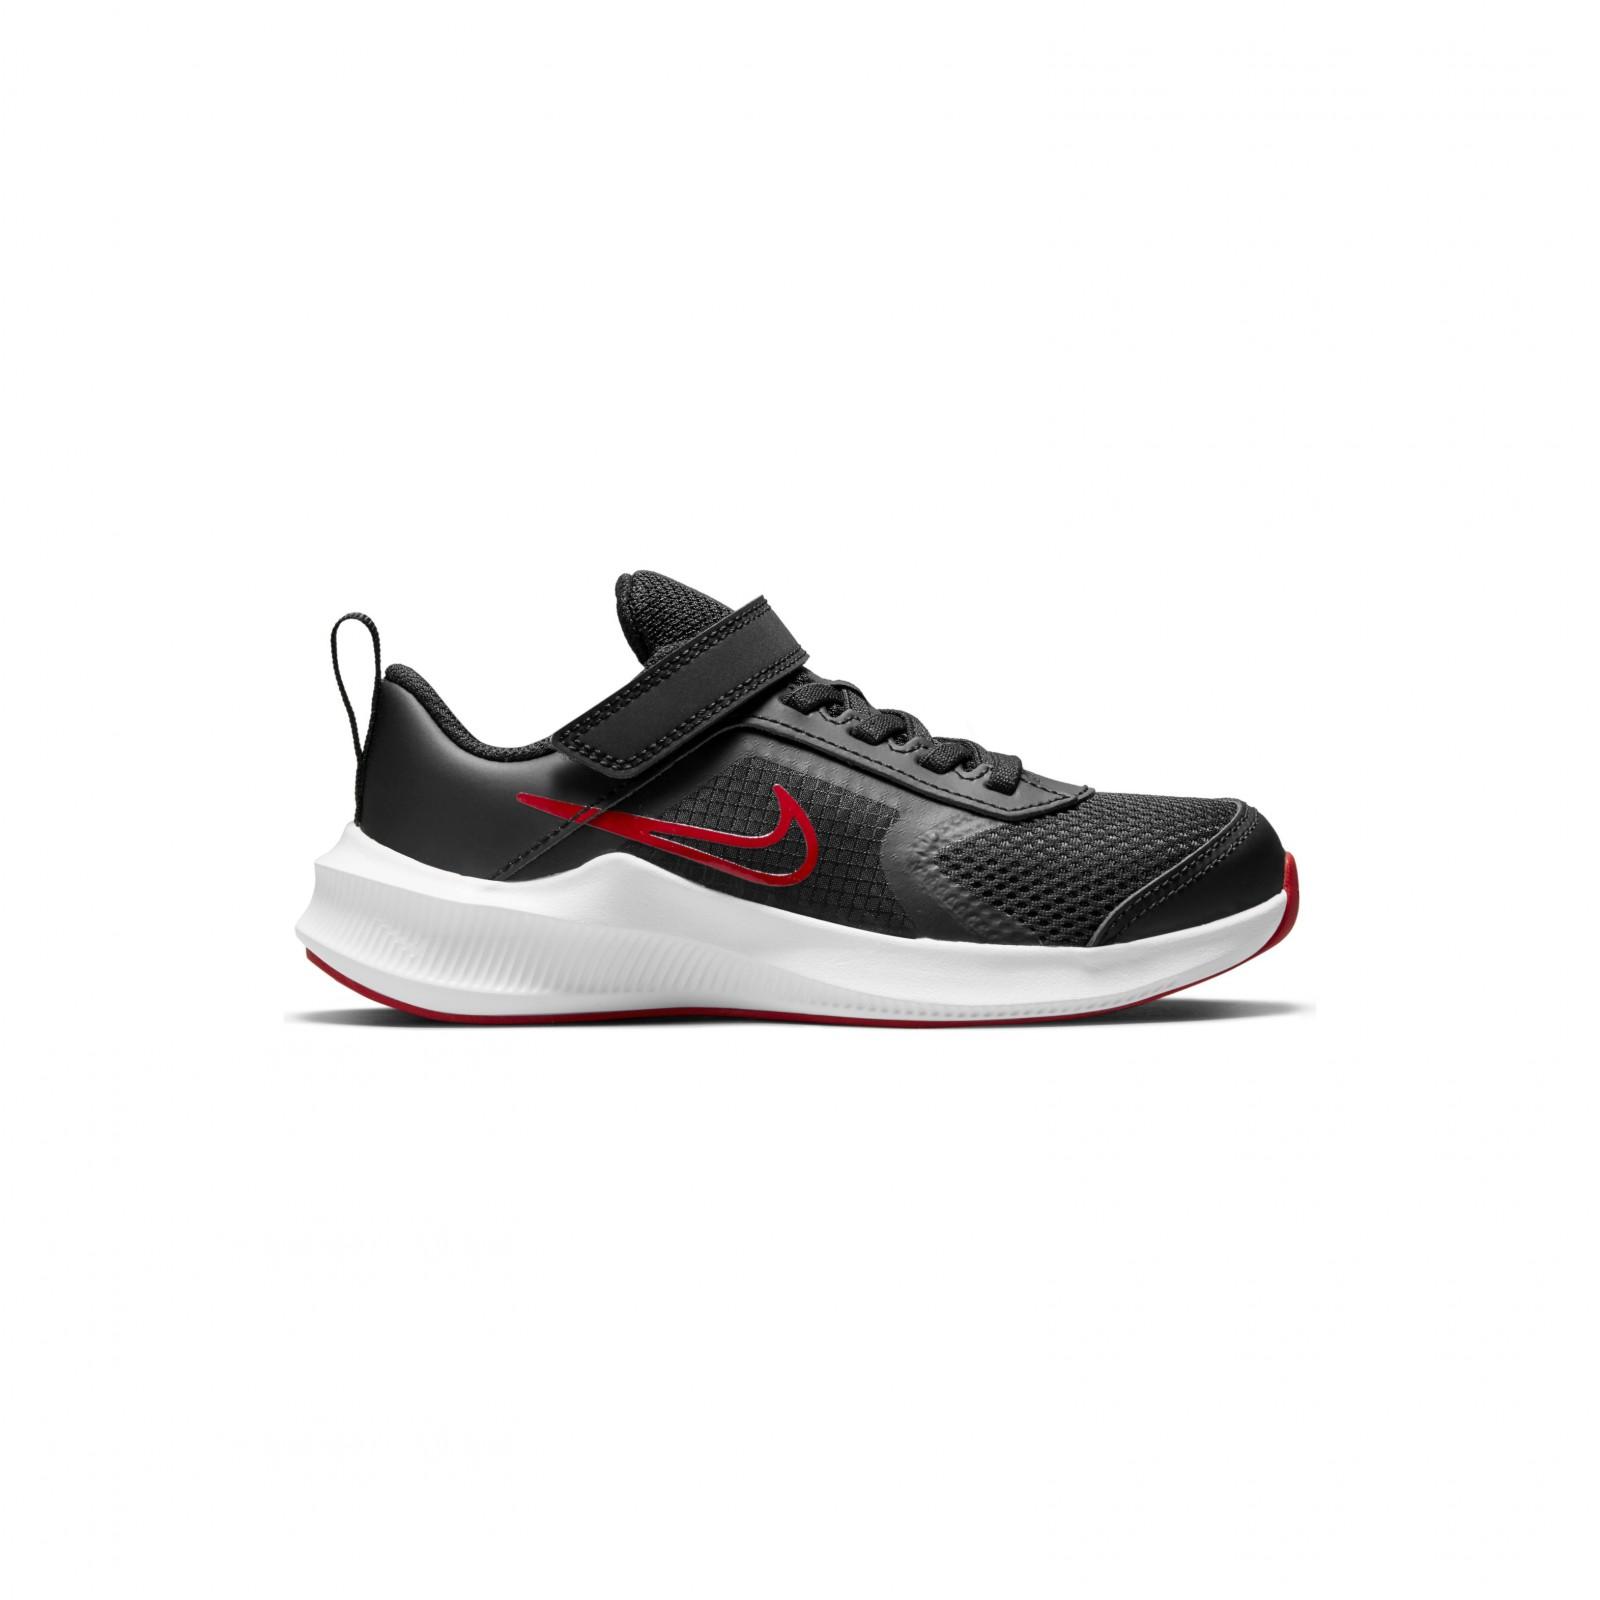 Nike Downshifter 11 BLACK/UNIVERSITY RED-DK SMOKE GREY-WHITE